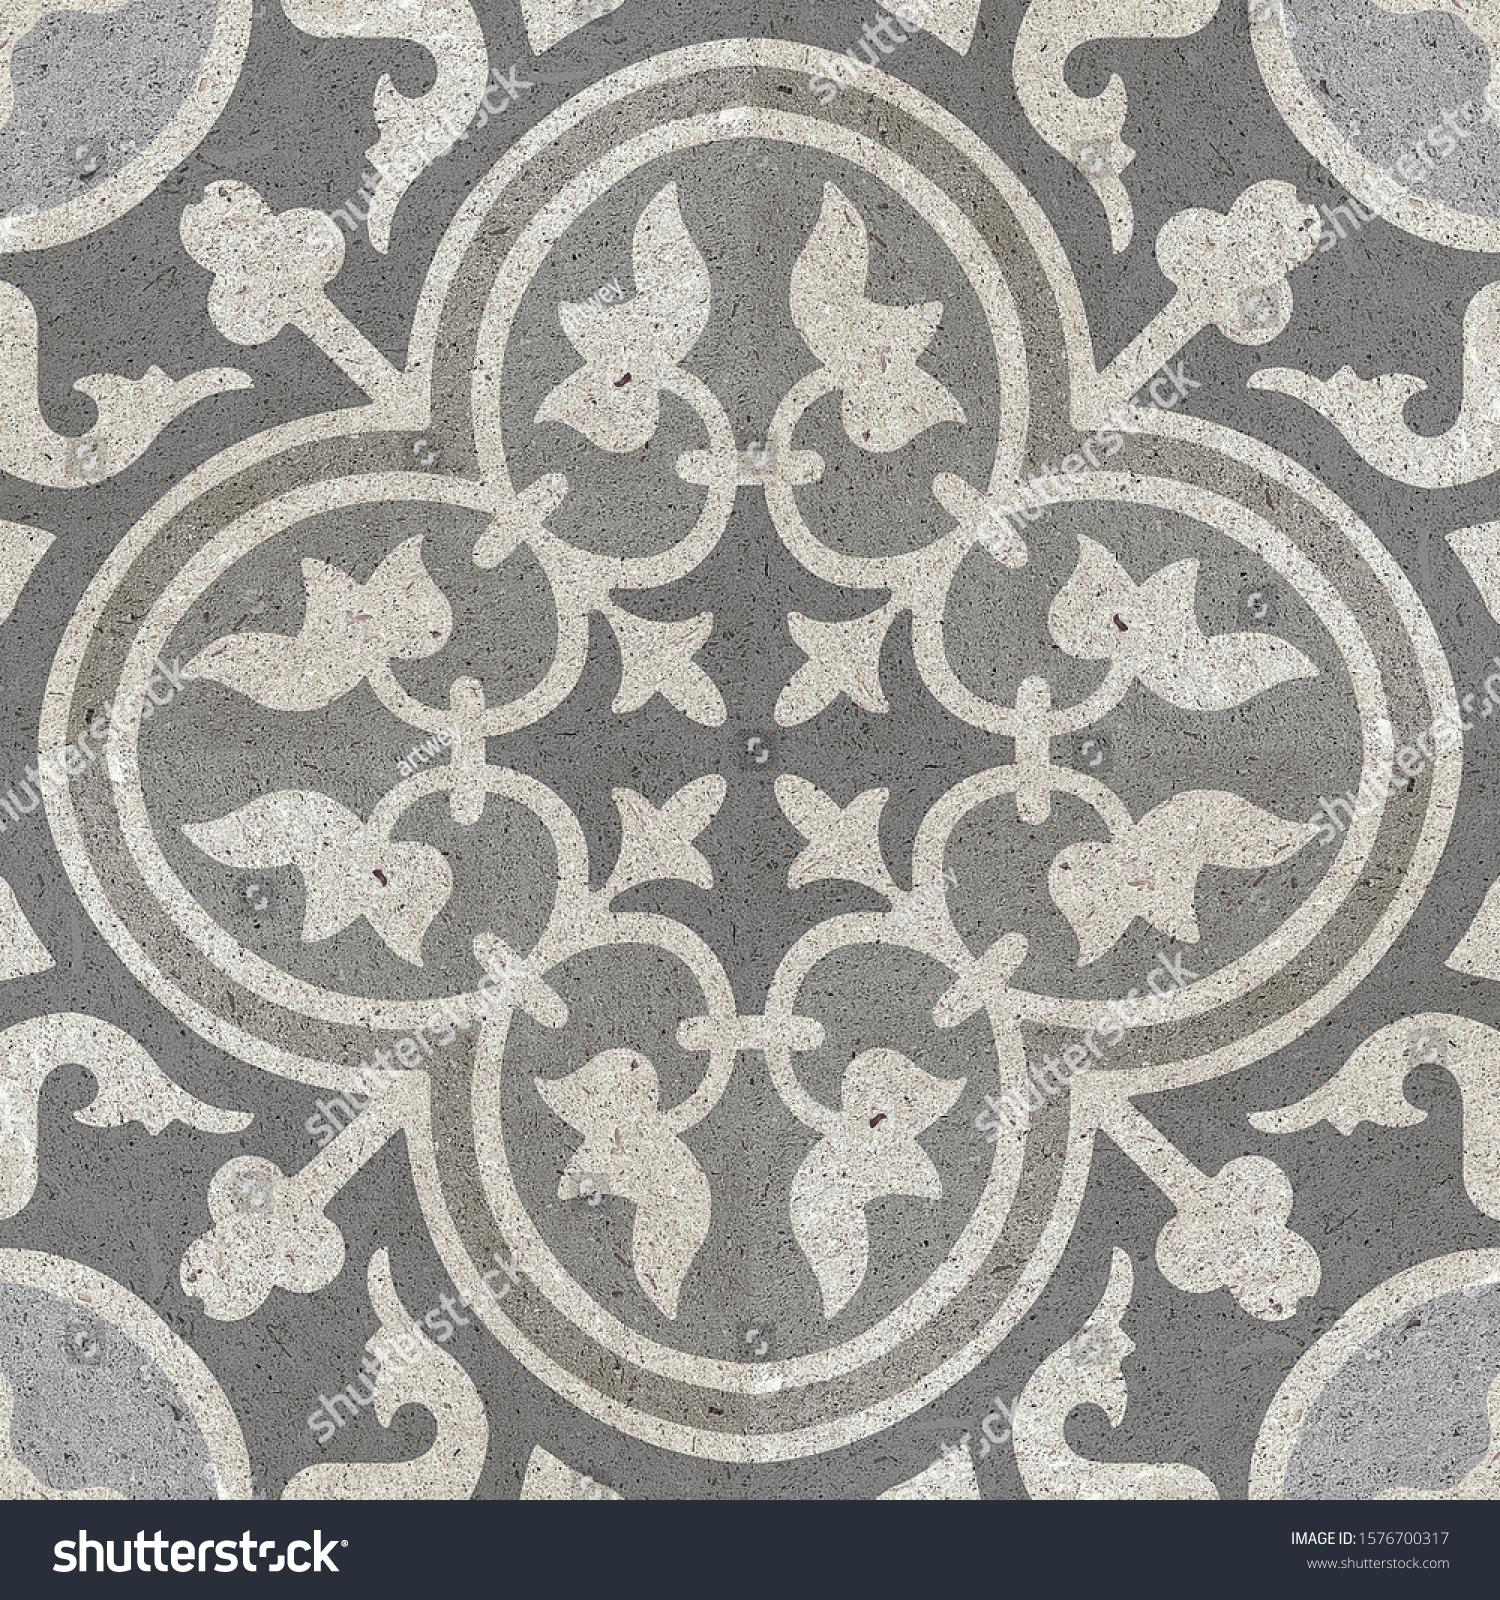 https www shutterstock com image photo ceramic background rustic decorative floor tile 1576700317